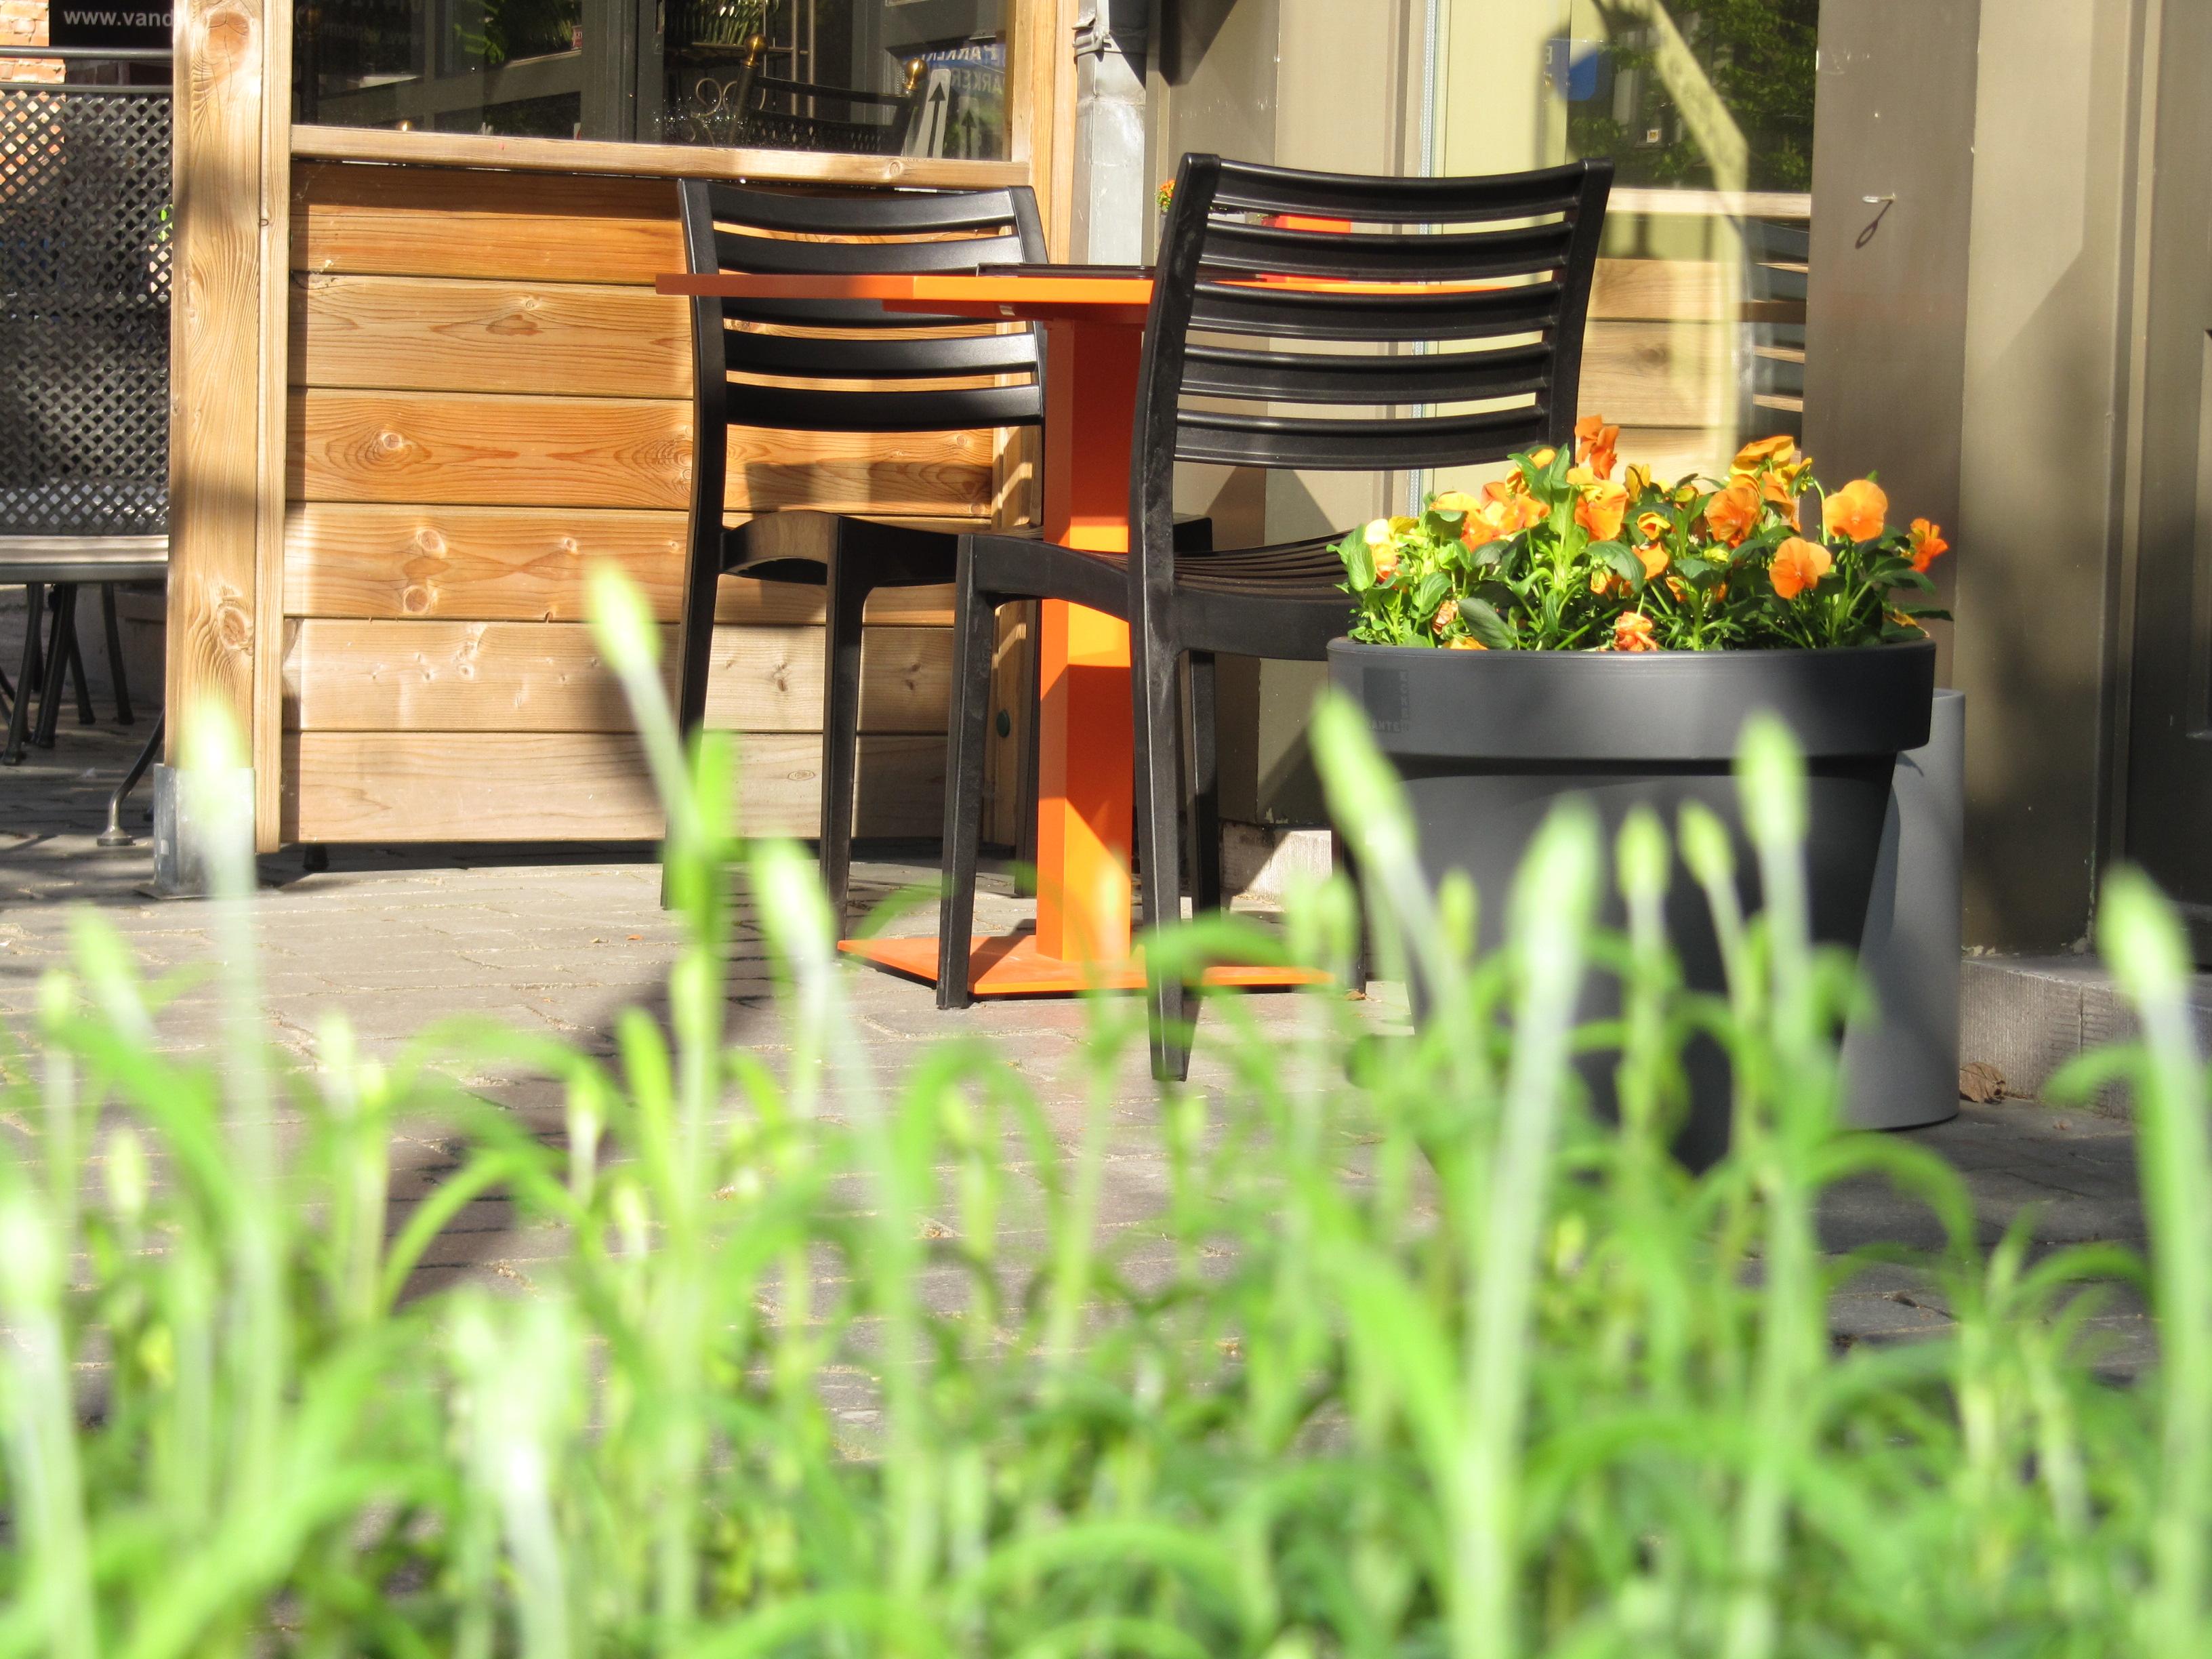 Keukenorkest Geel – Atumrecom # Wasbak Geel_212052